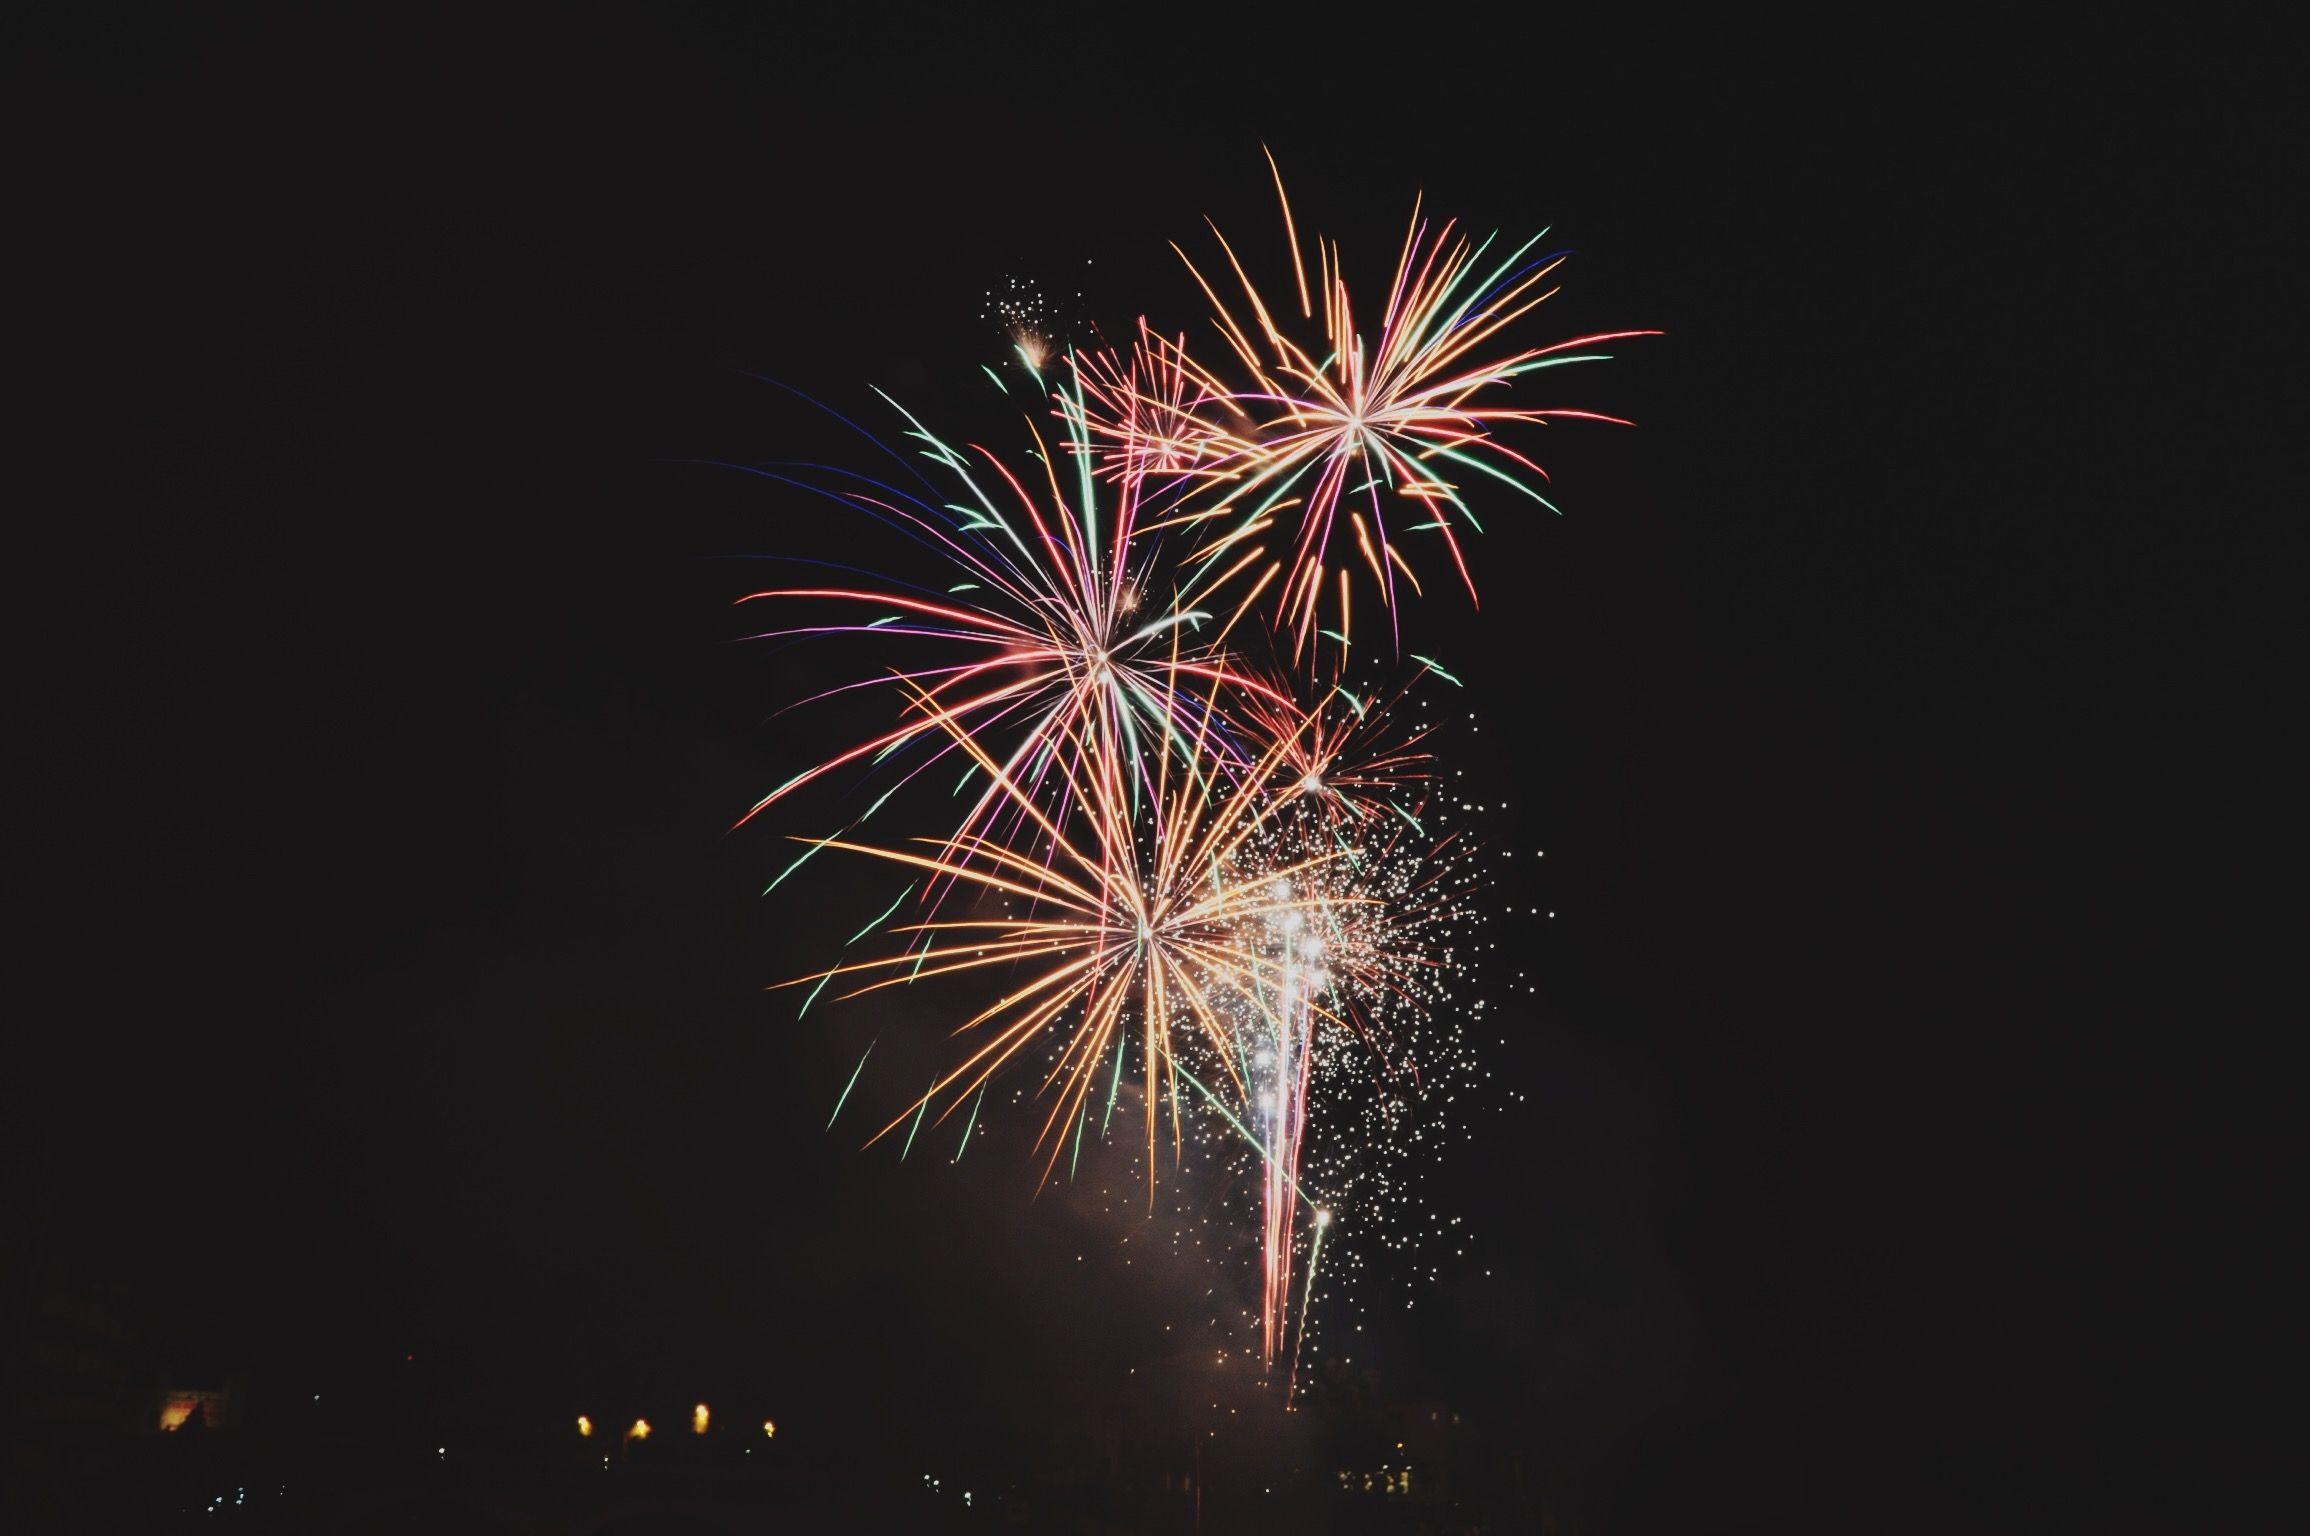 oklahoma city fireworks laws